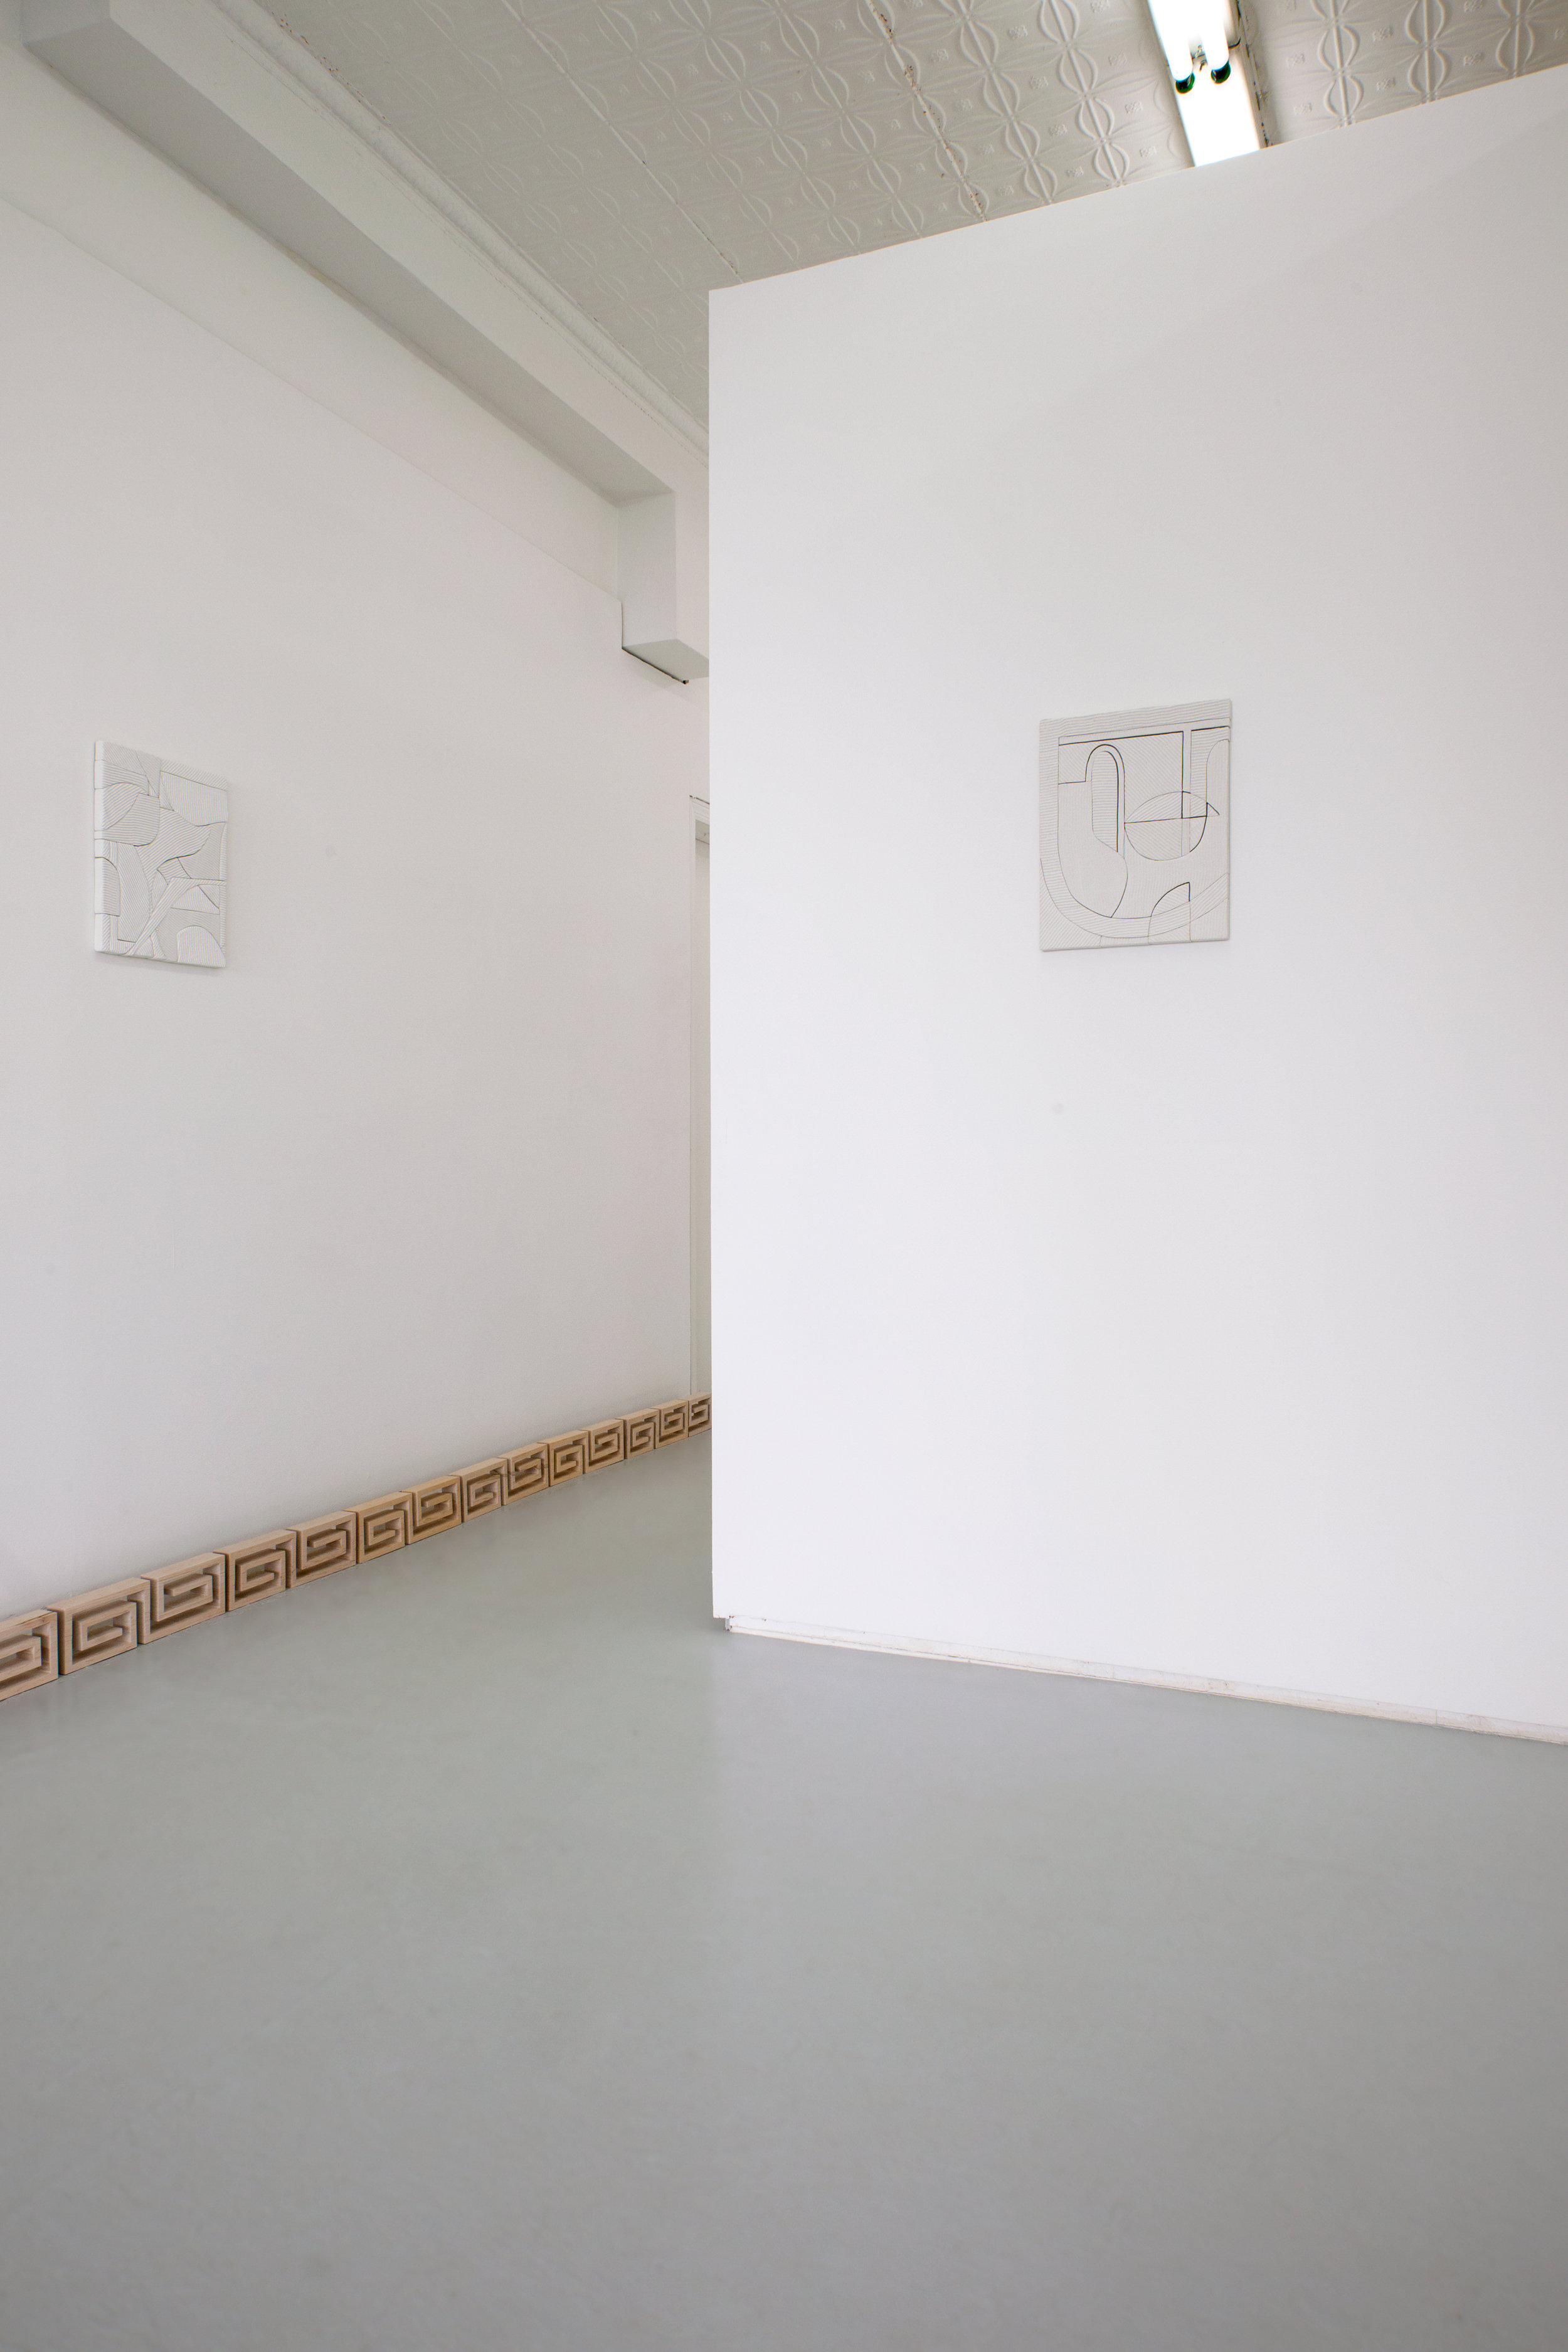 Elizabeth_Atterbury-Night_Comes_In-Installation_View_009.jpg